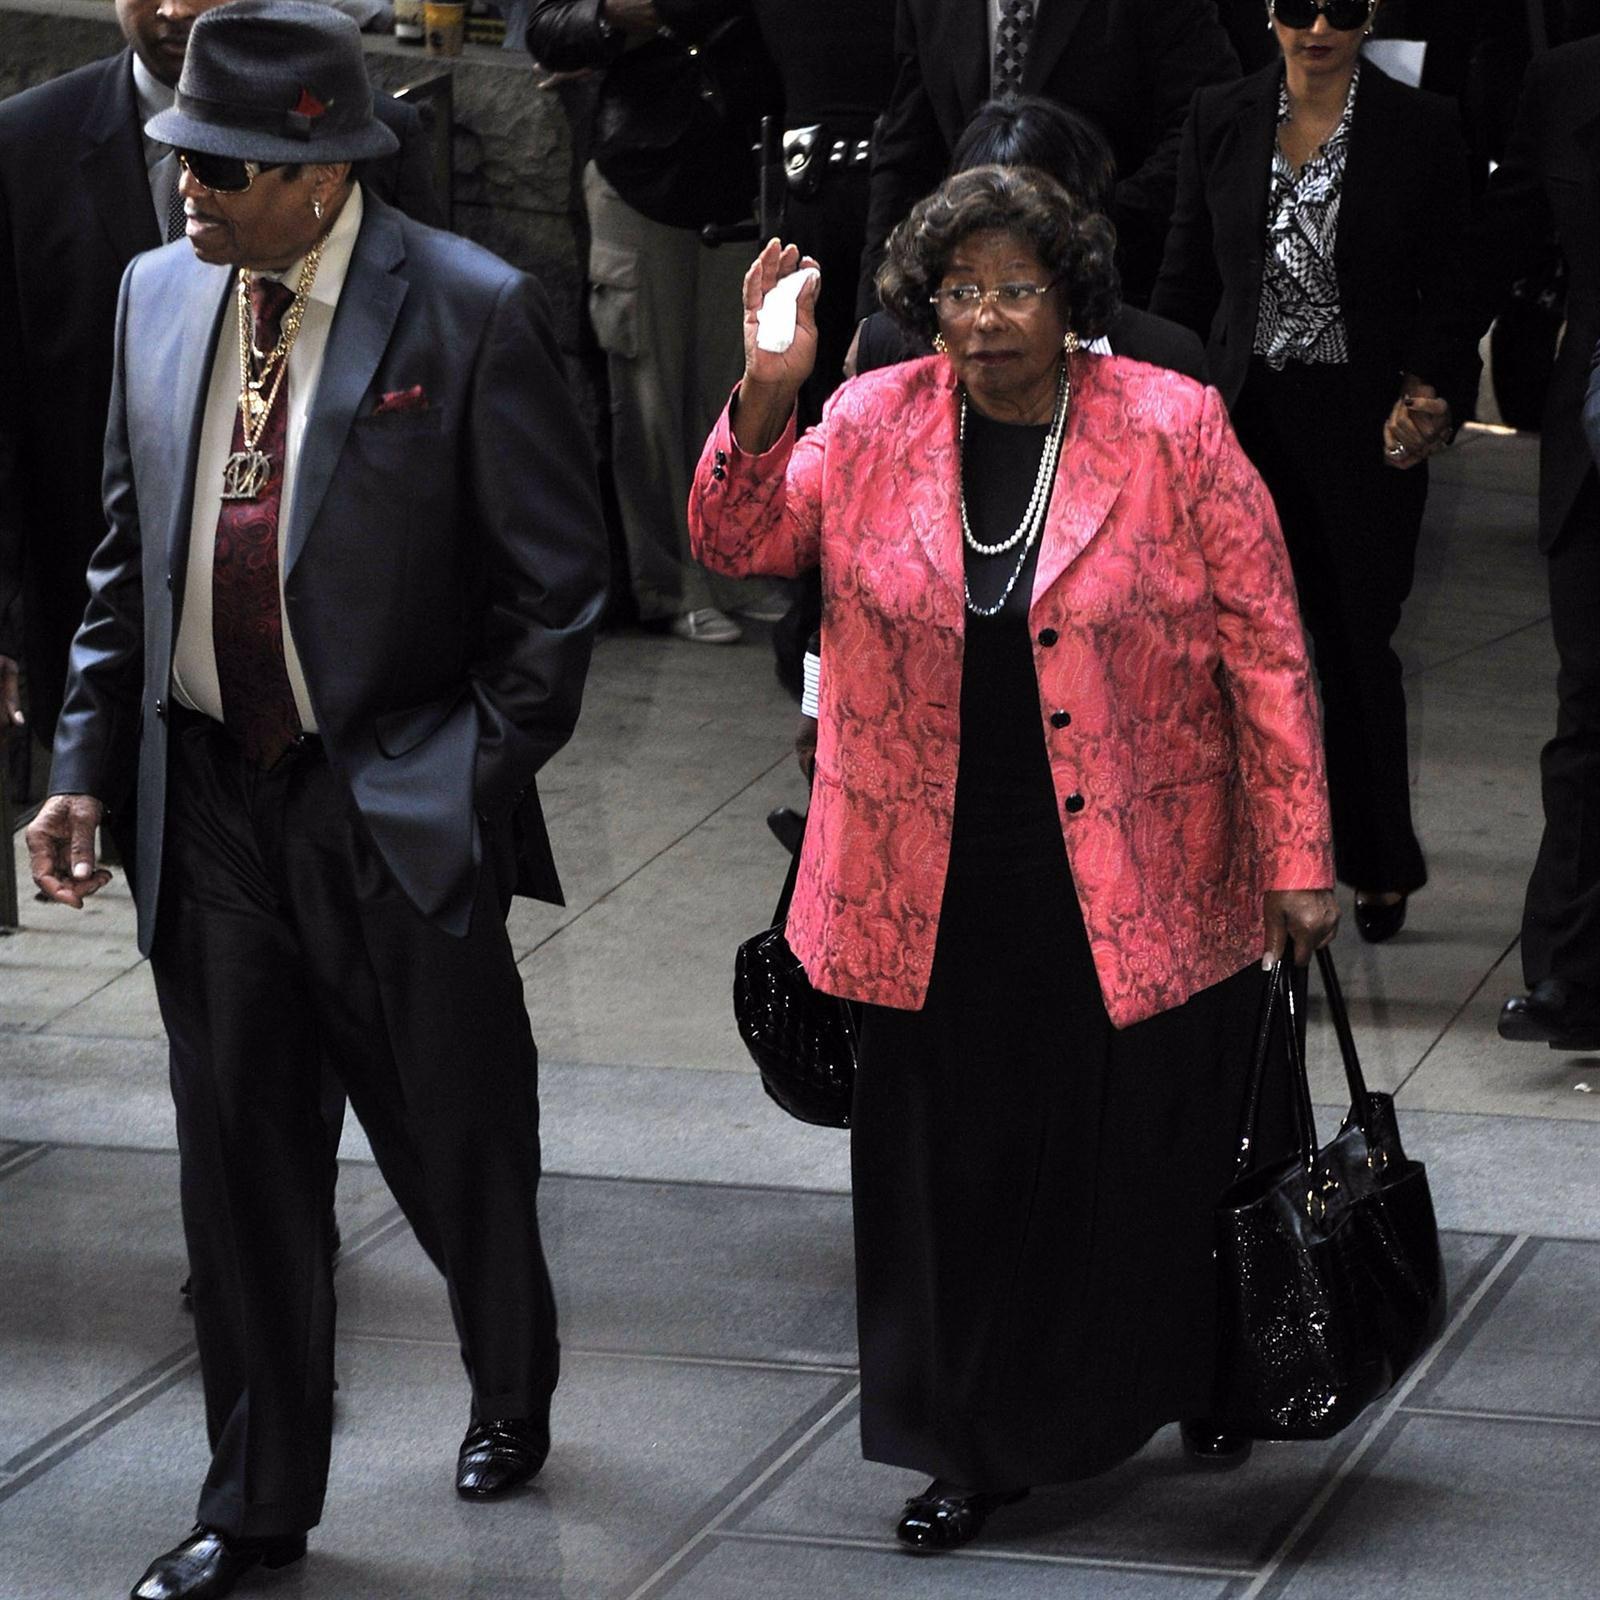 Joe Jackson And Katherine Jackson Arrive At Court